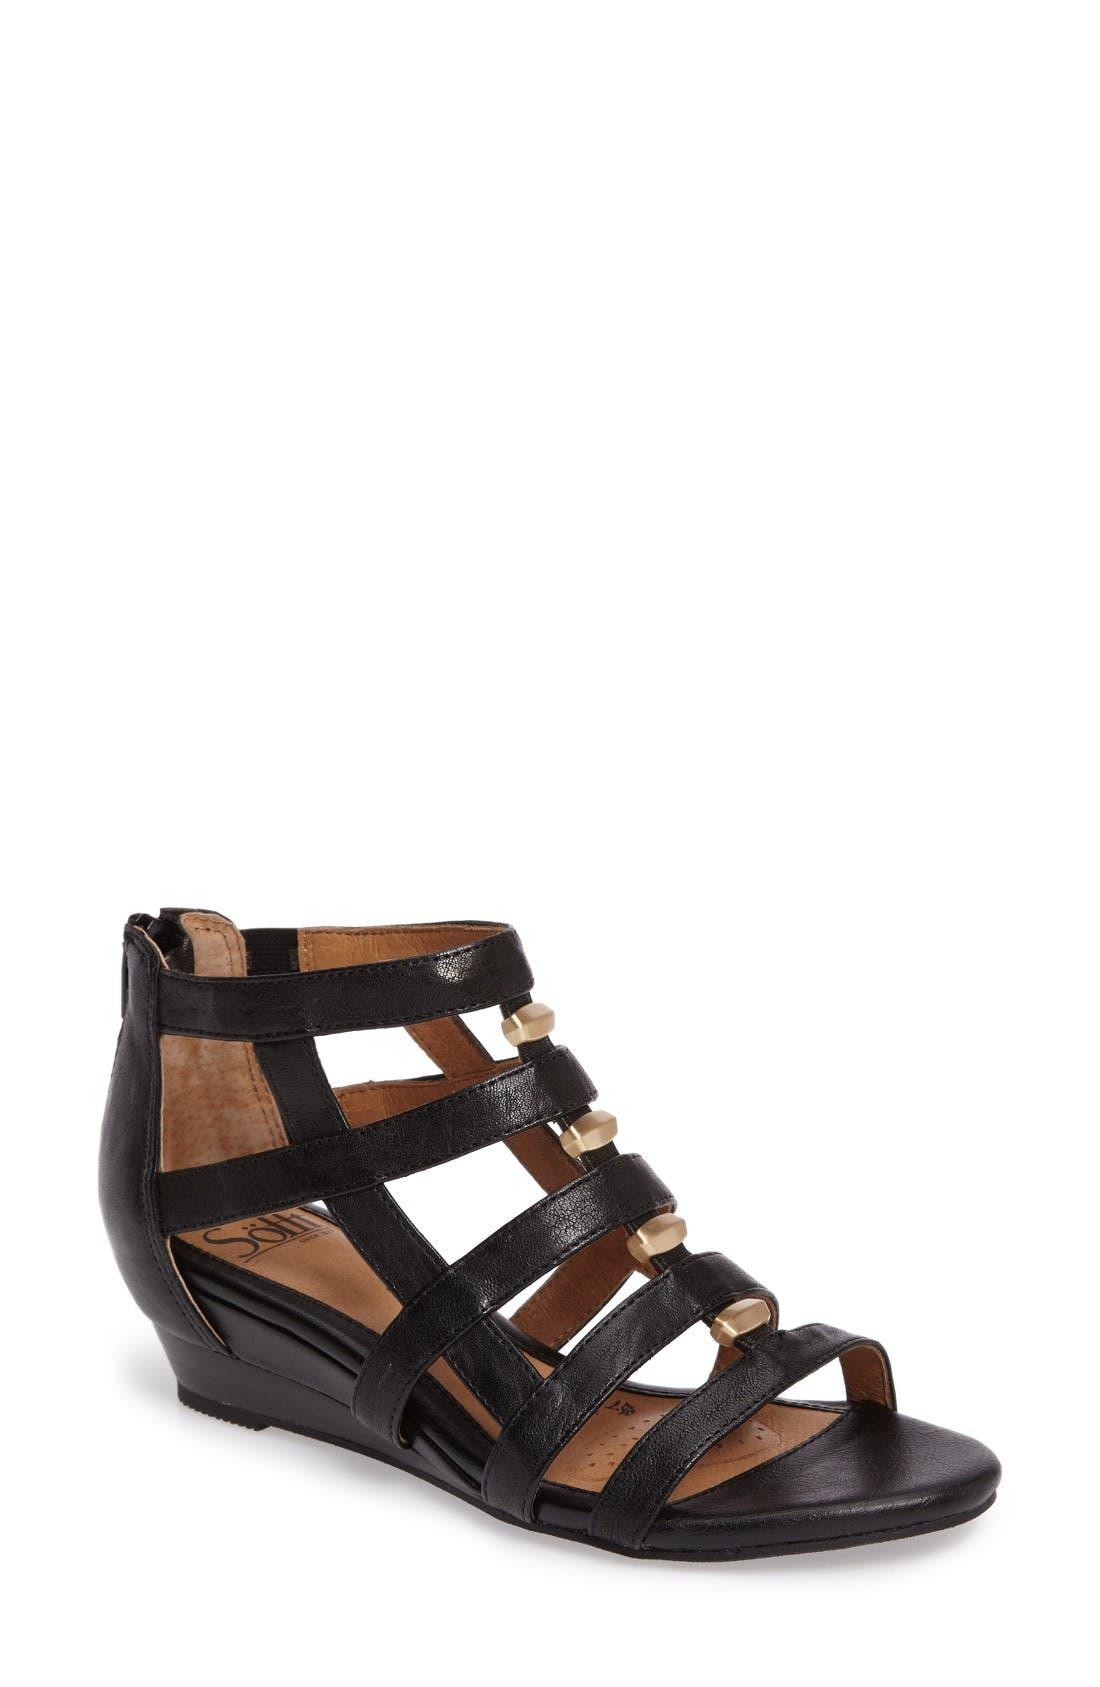 Rio Gladiator Wedge Sandal,                             Main thumbnail 1, color,                             Black Leather